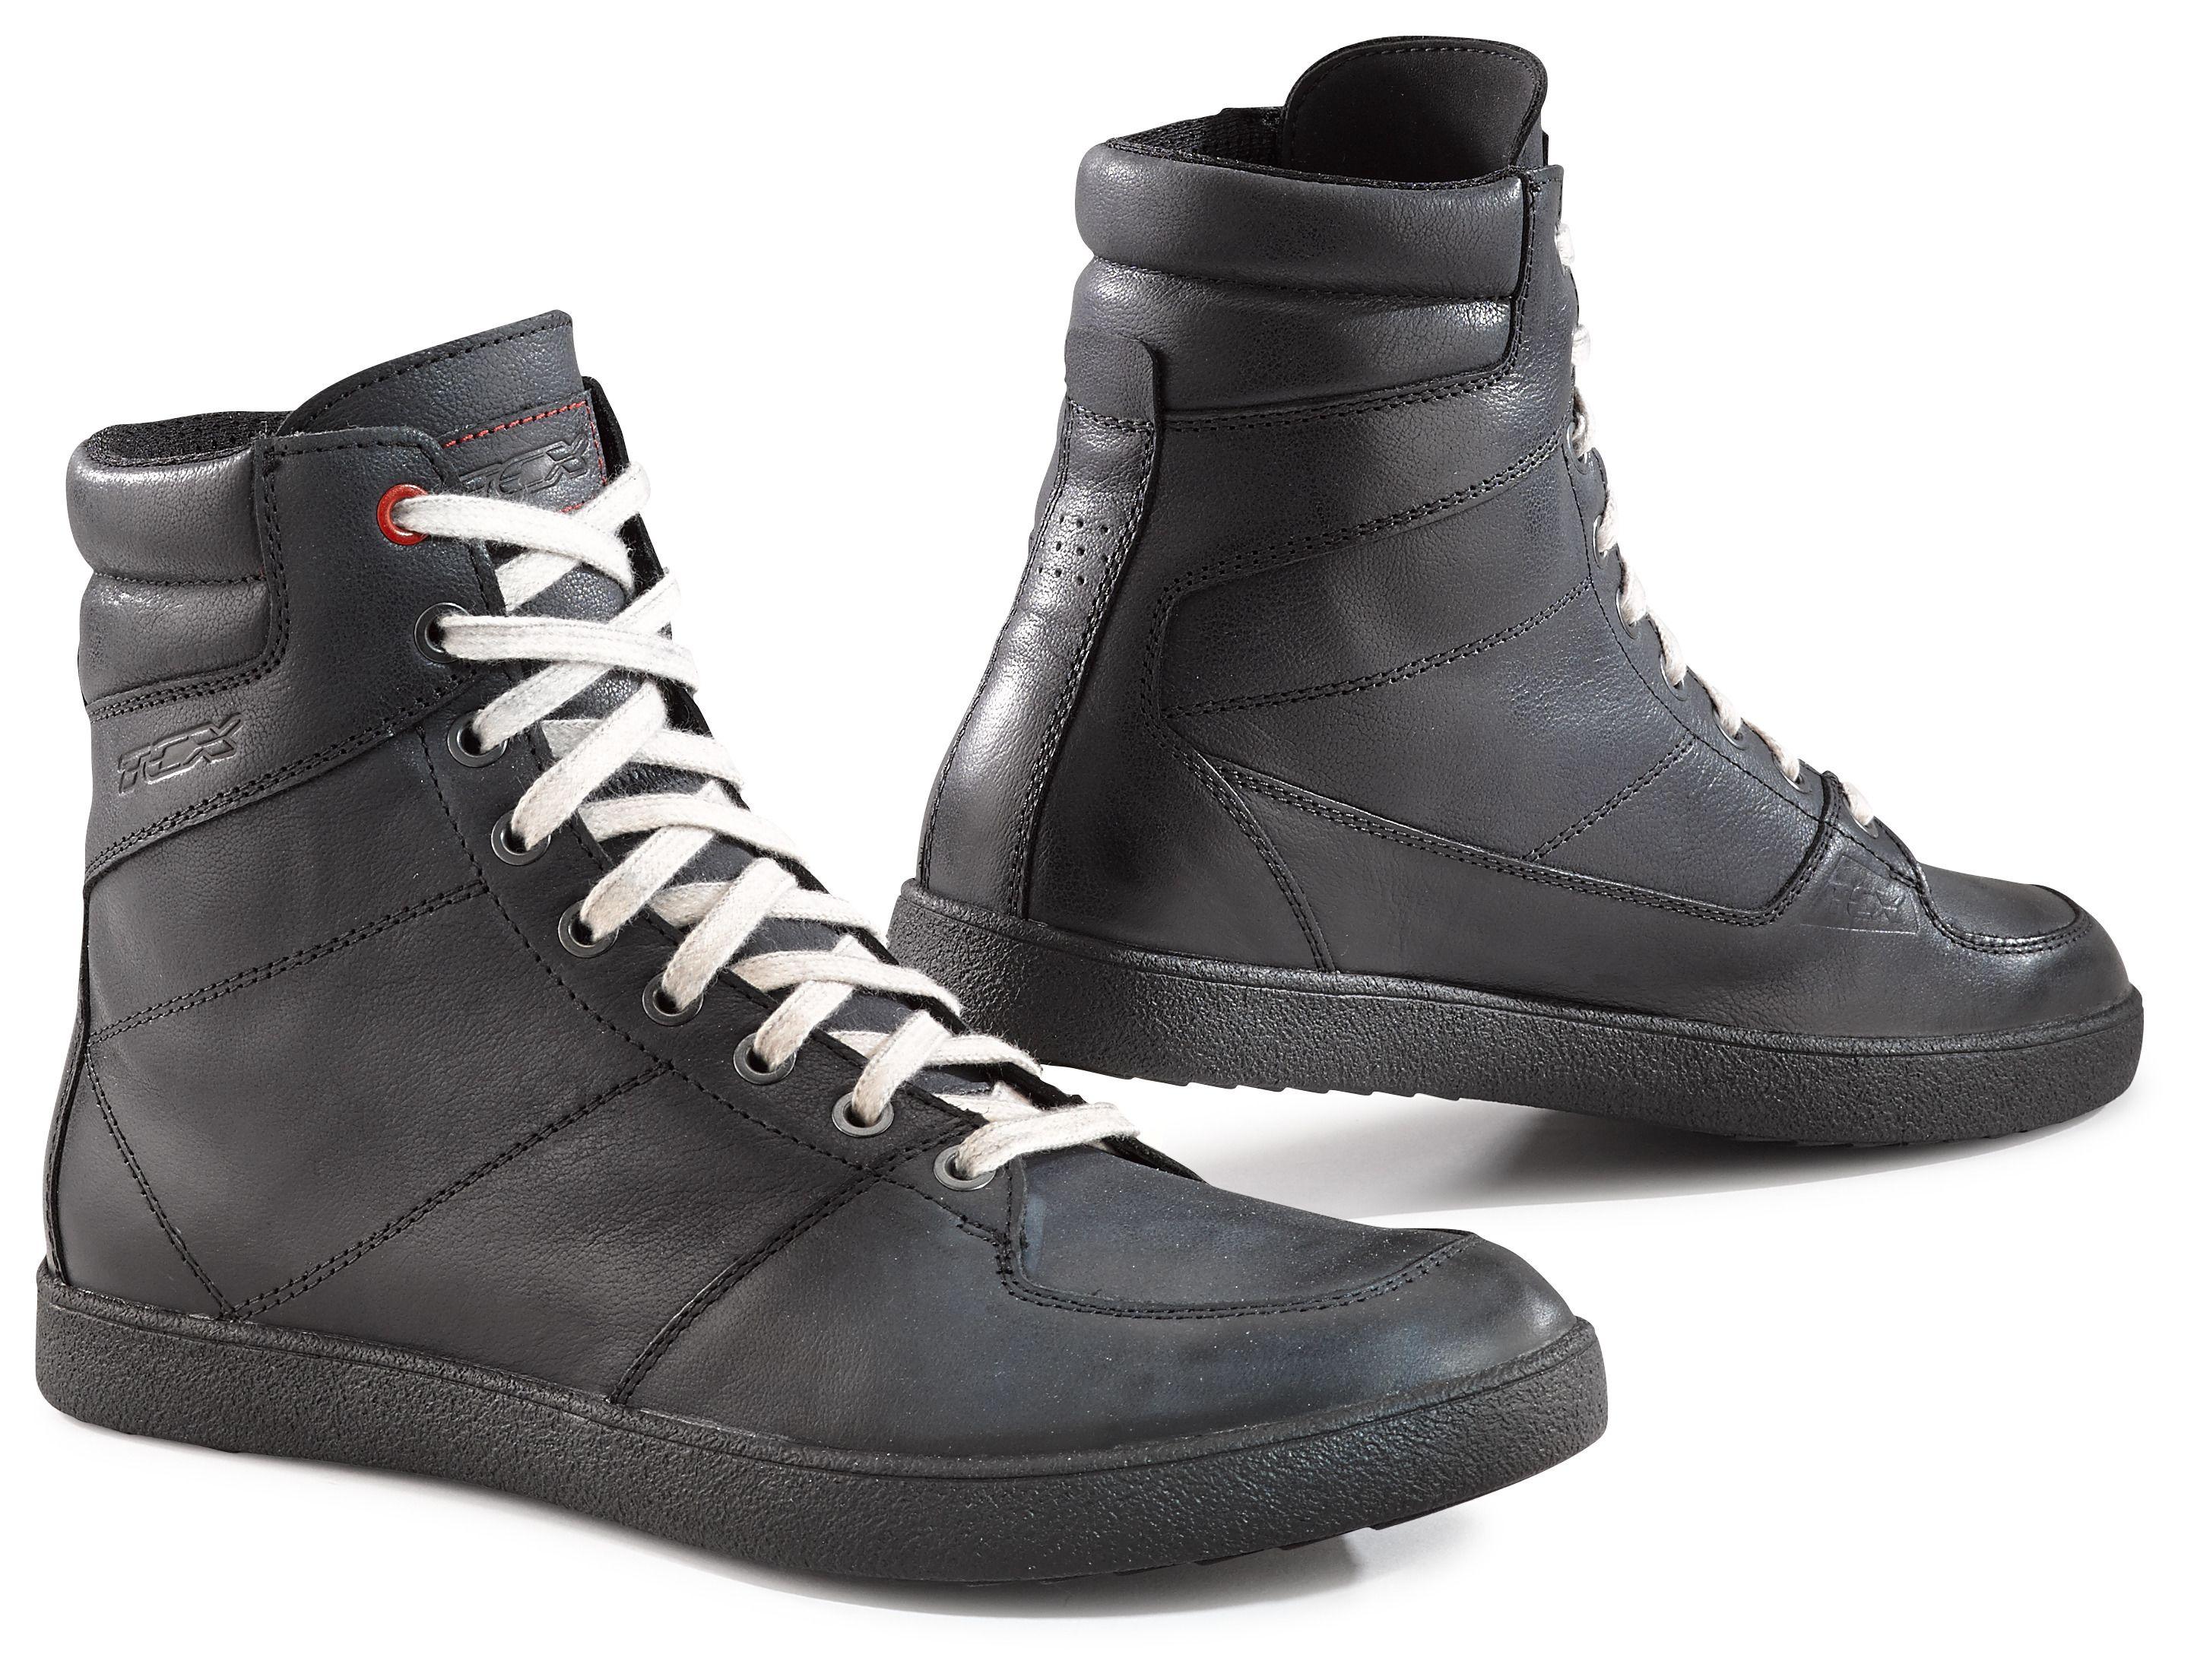 Tcx X Wave Waterproof Shoes Revzilla